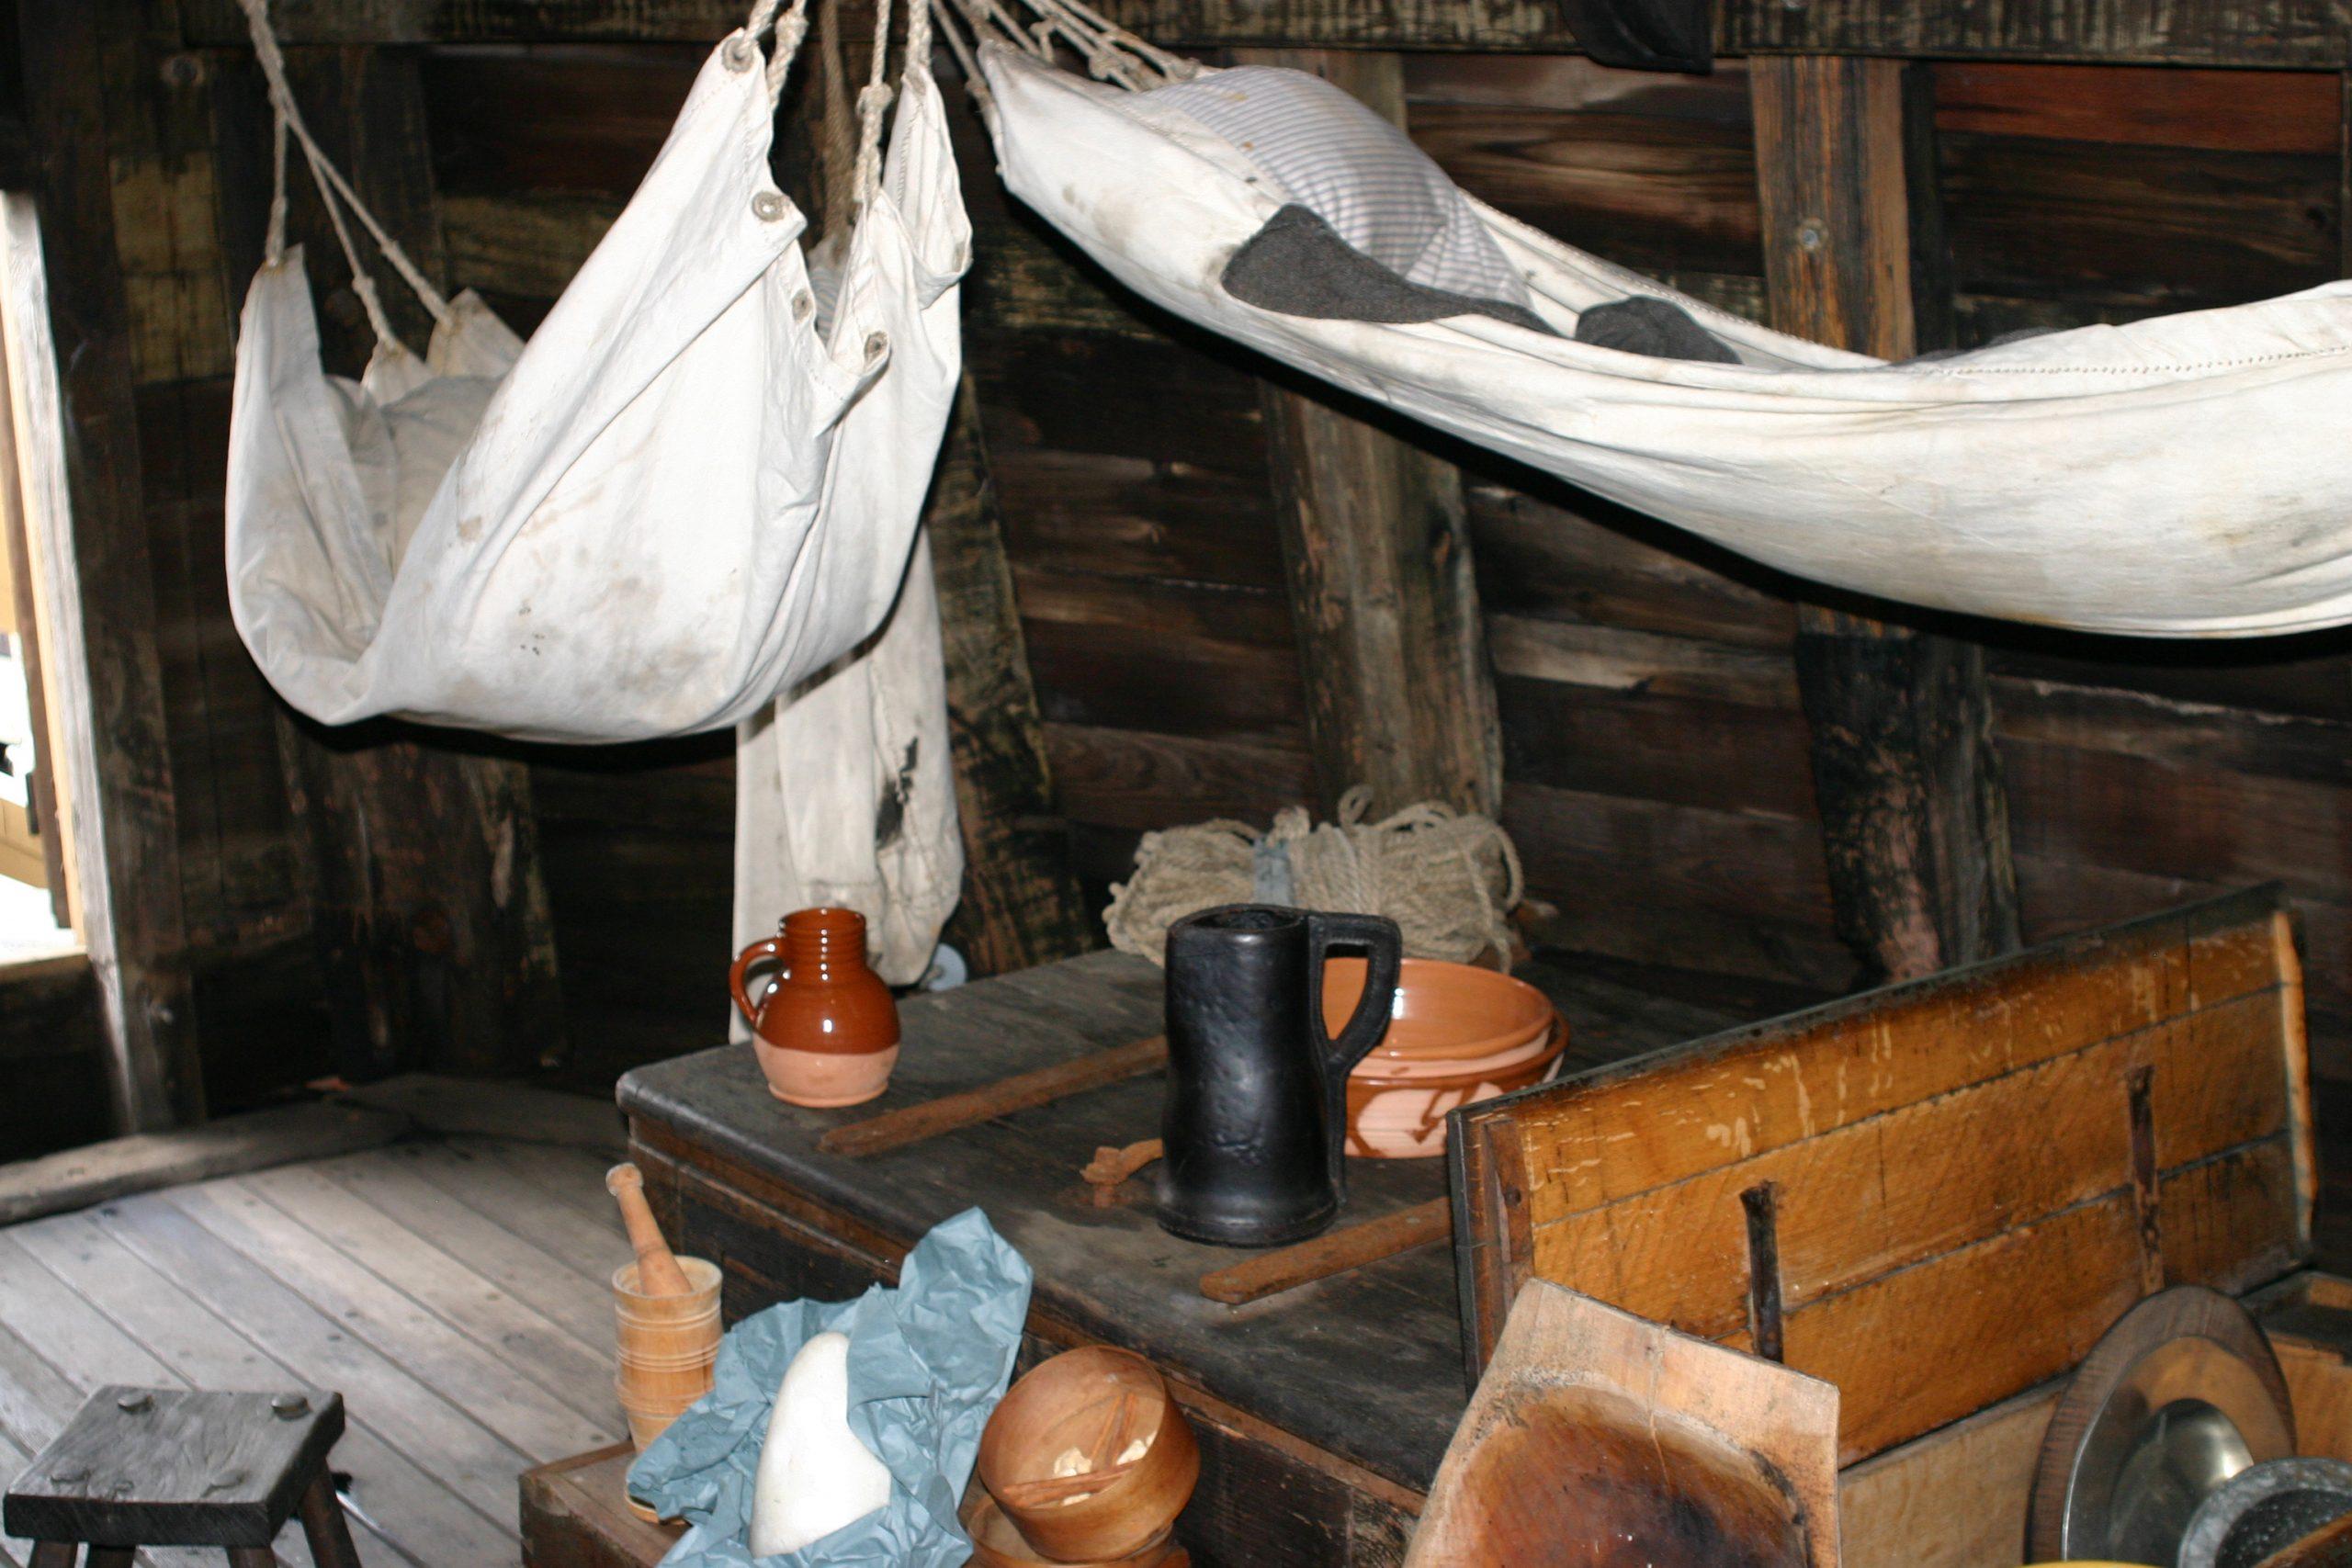 Mayflower reproduction interior